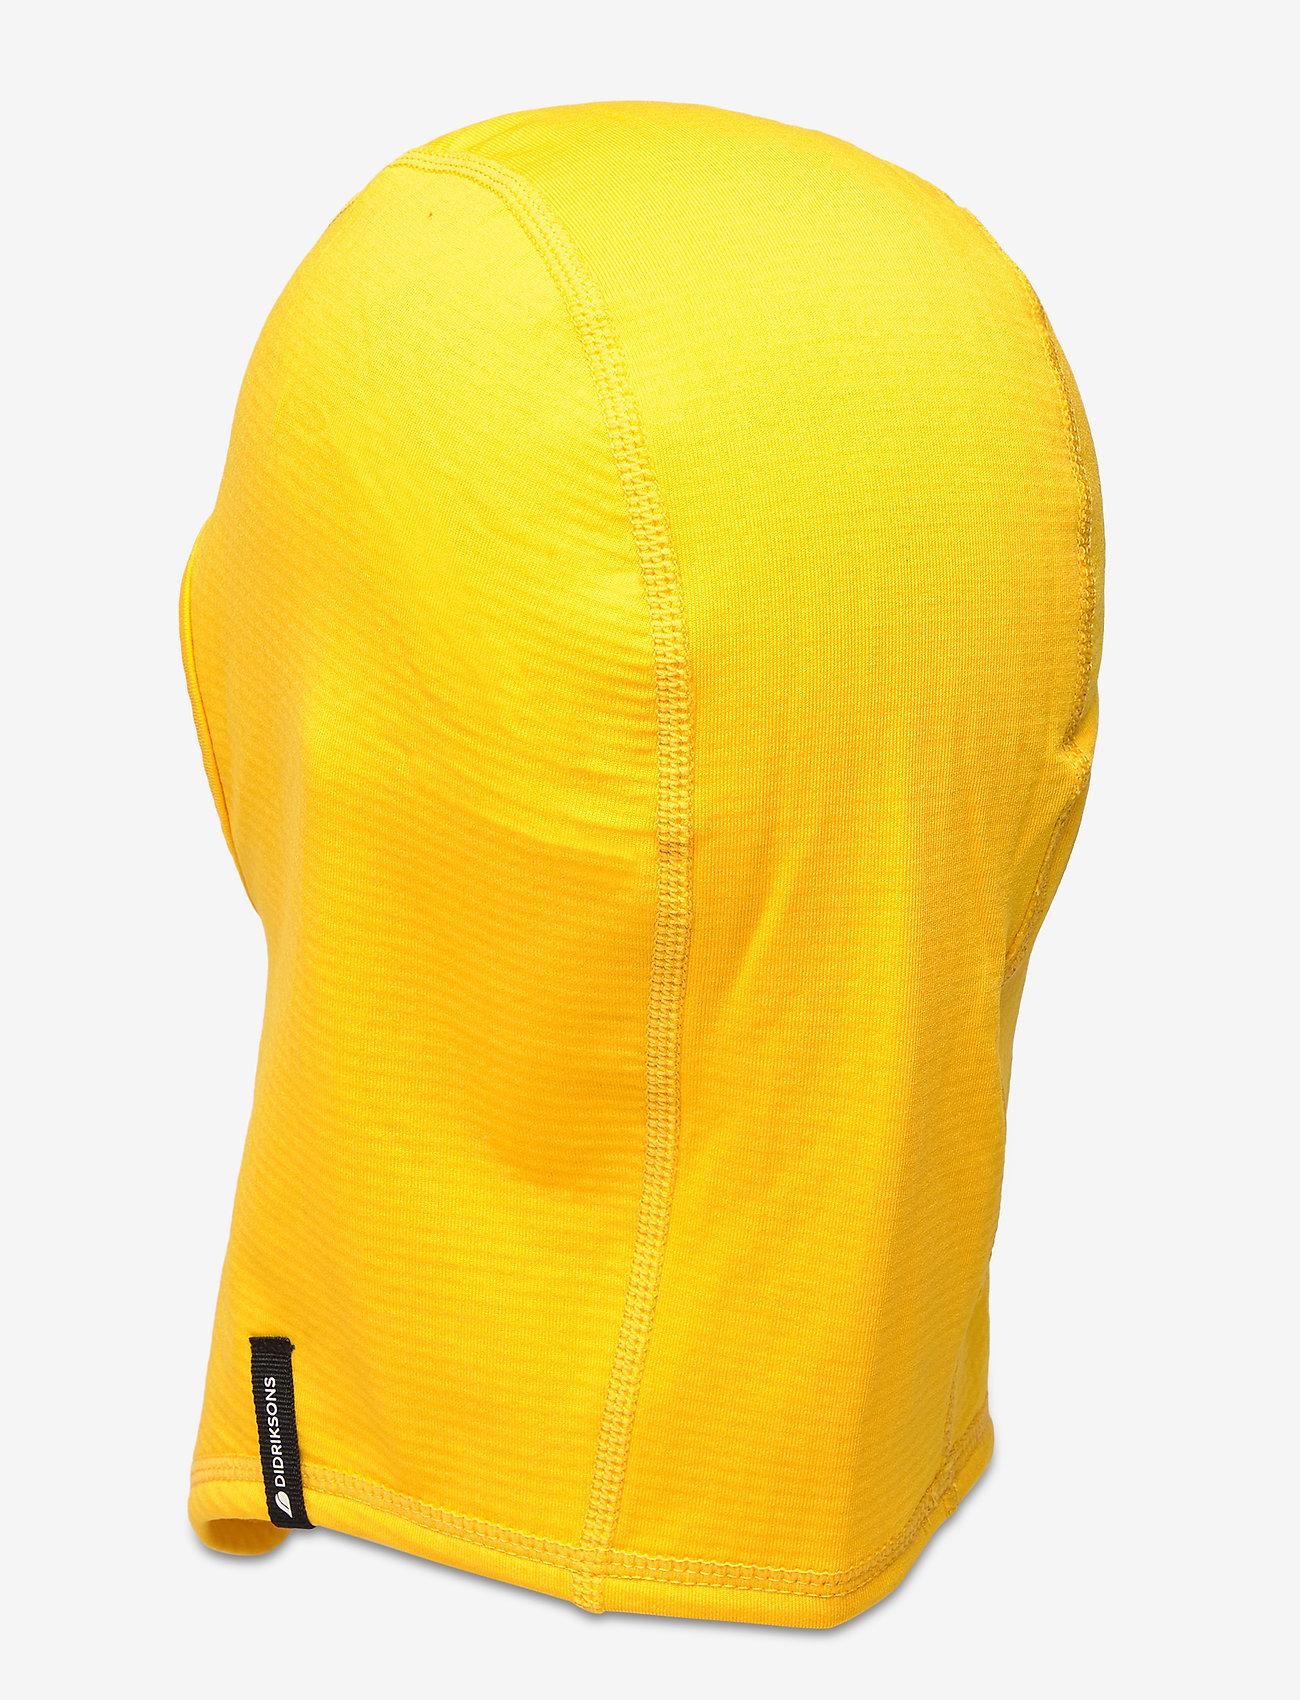 Didriksons - REVA KIDS BALACLAVA - balaclava - mellow yellow - 1